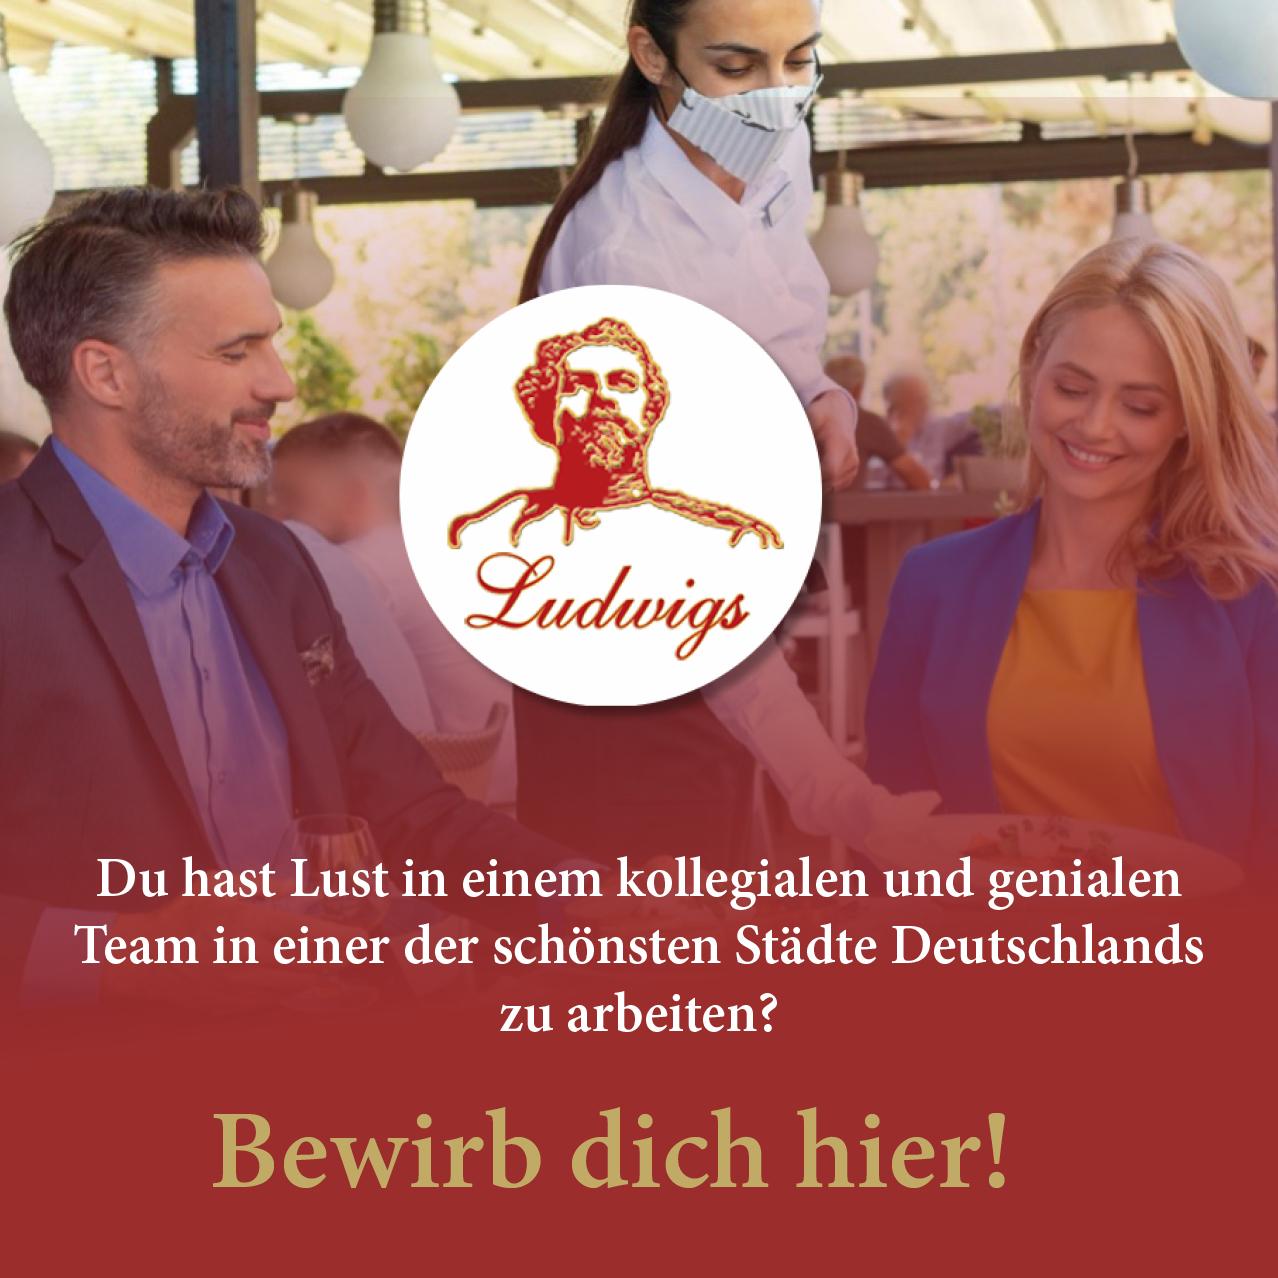 Jobanzeige hotel Ludwigs